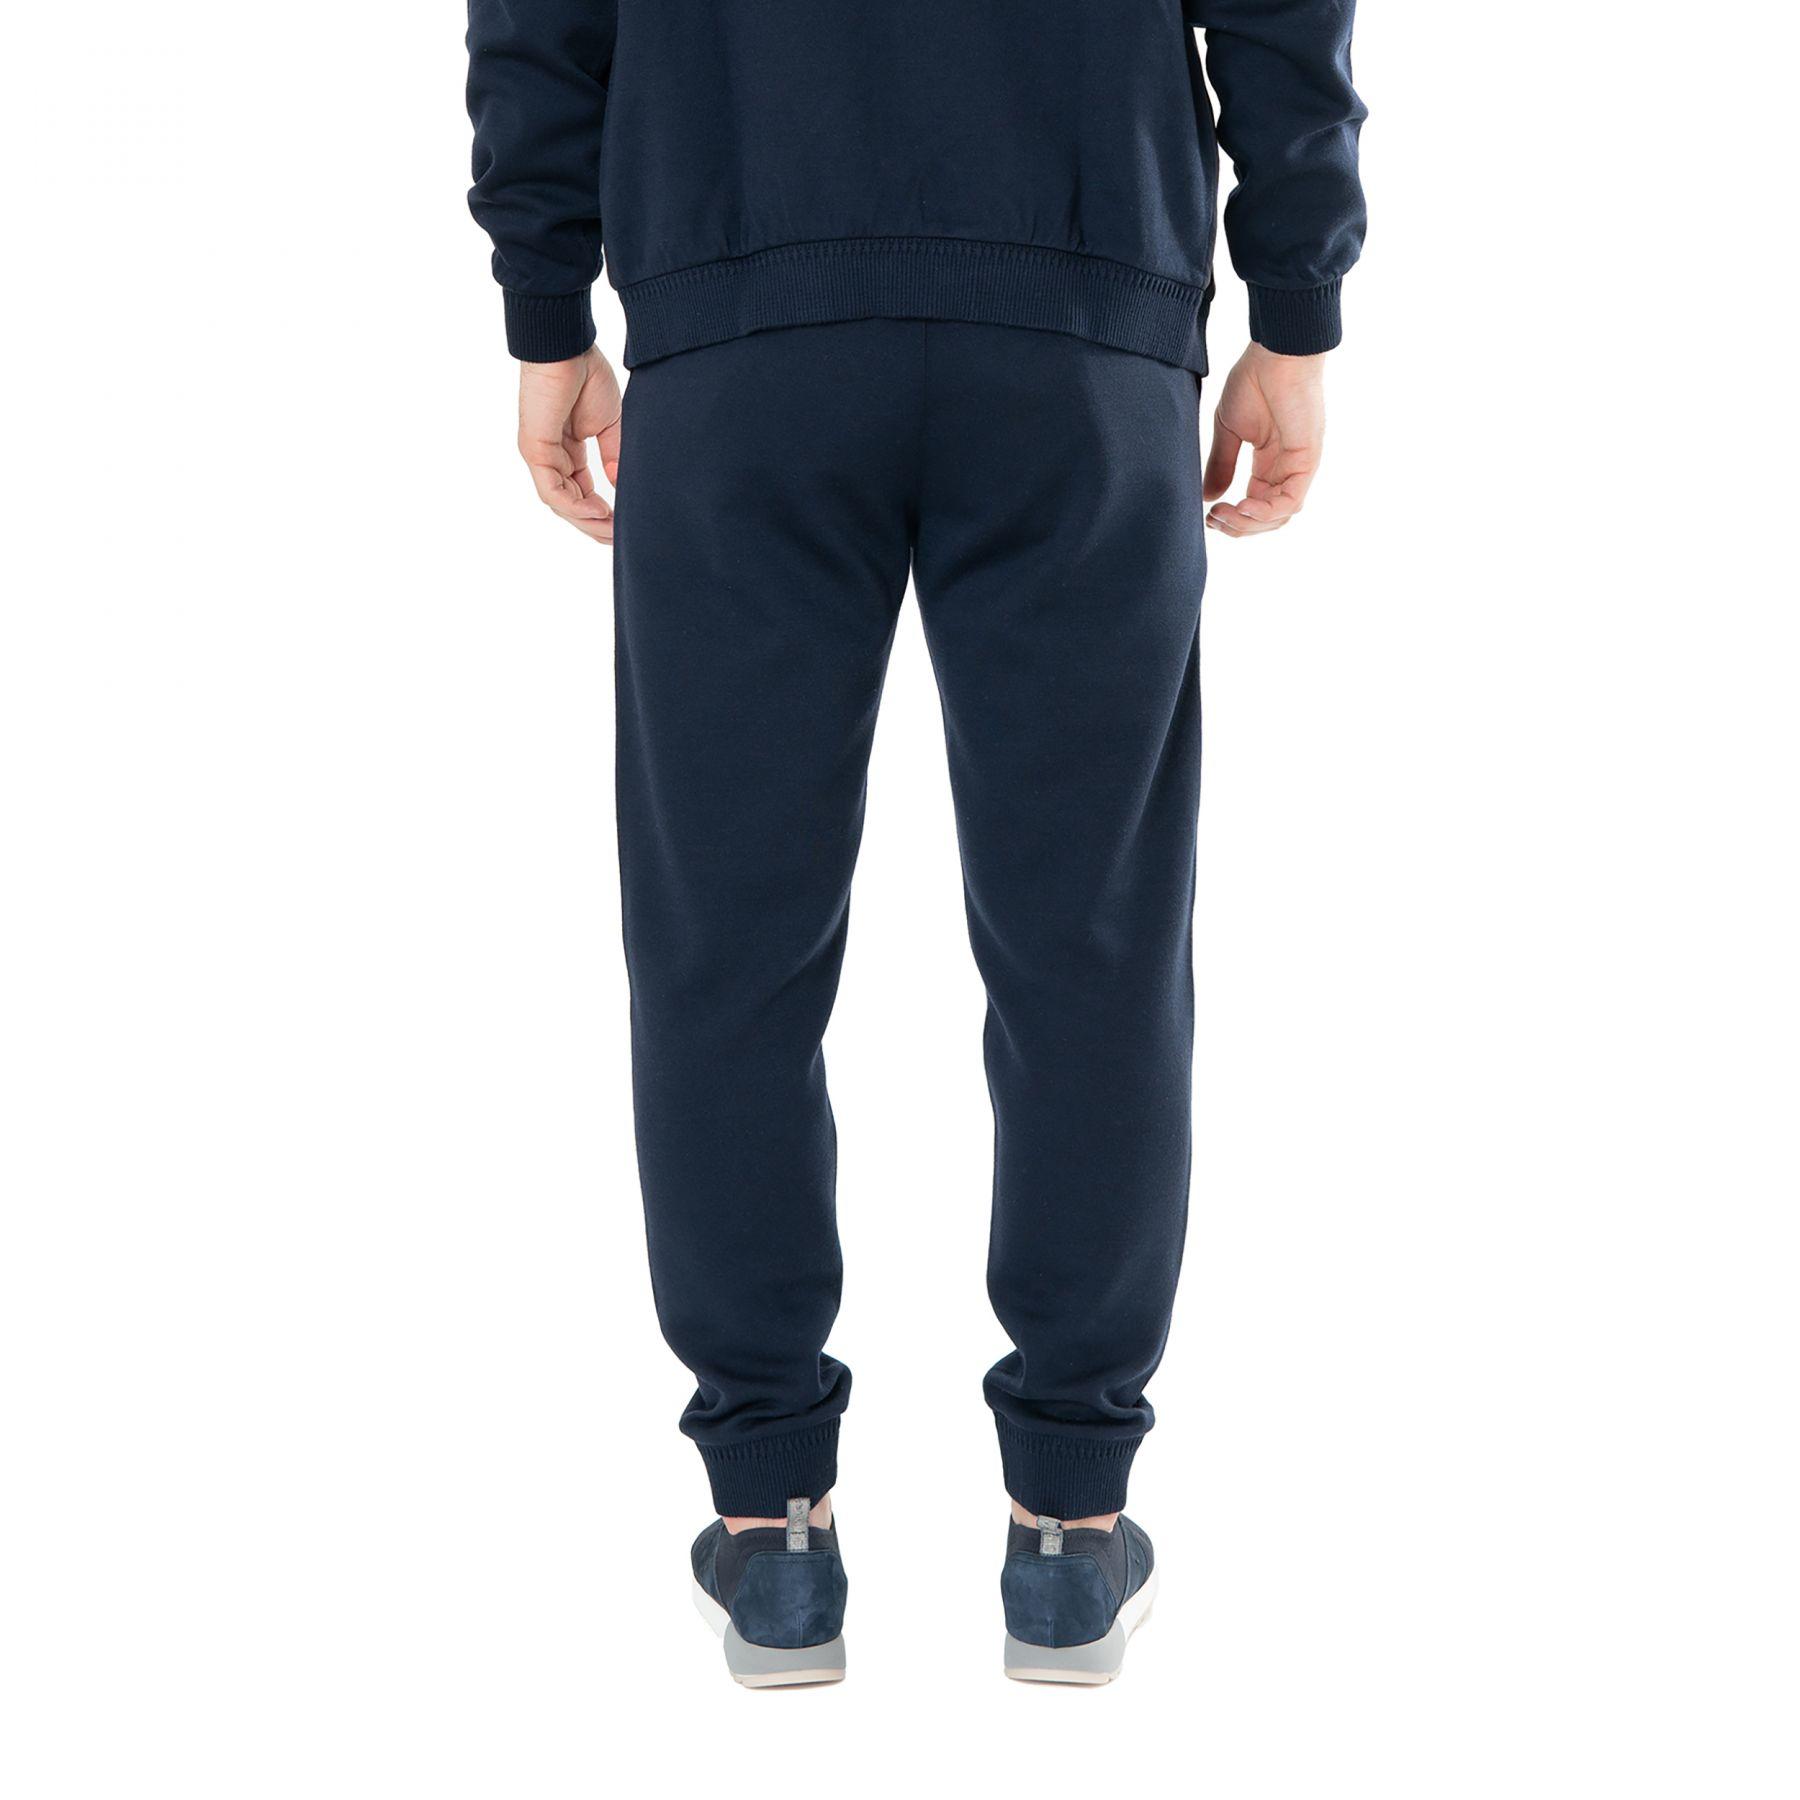 Спортивные брюки Brett Johnson темно-синие